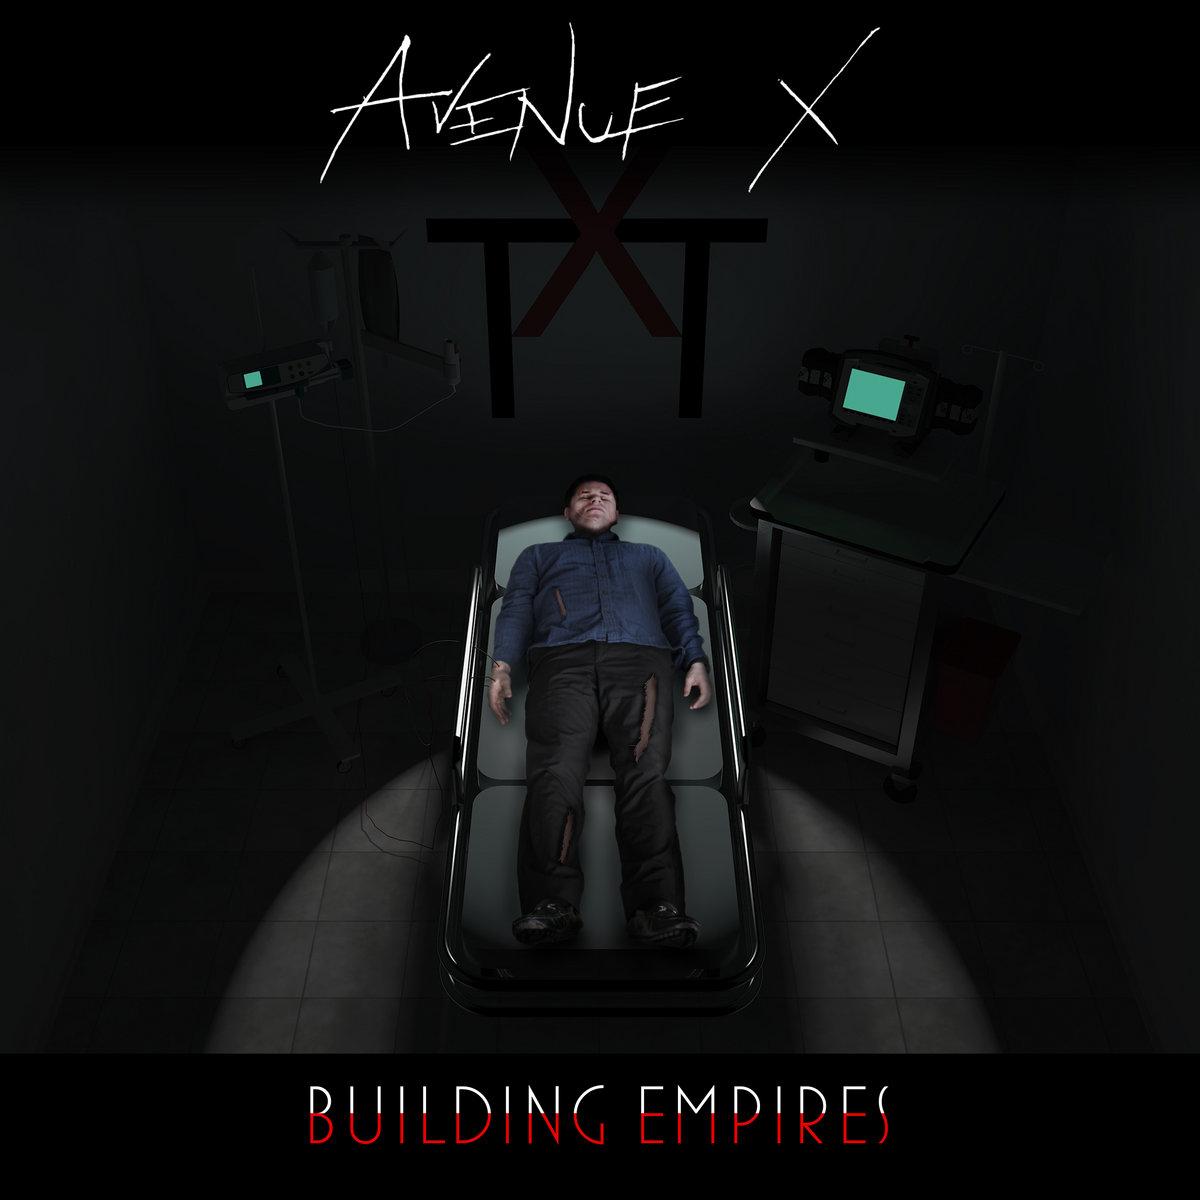 Avenue X - Building Empire